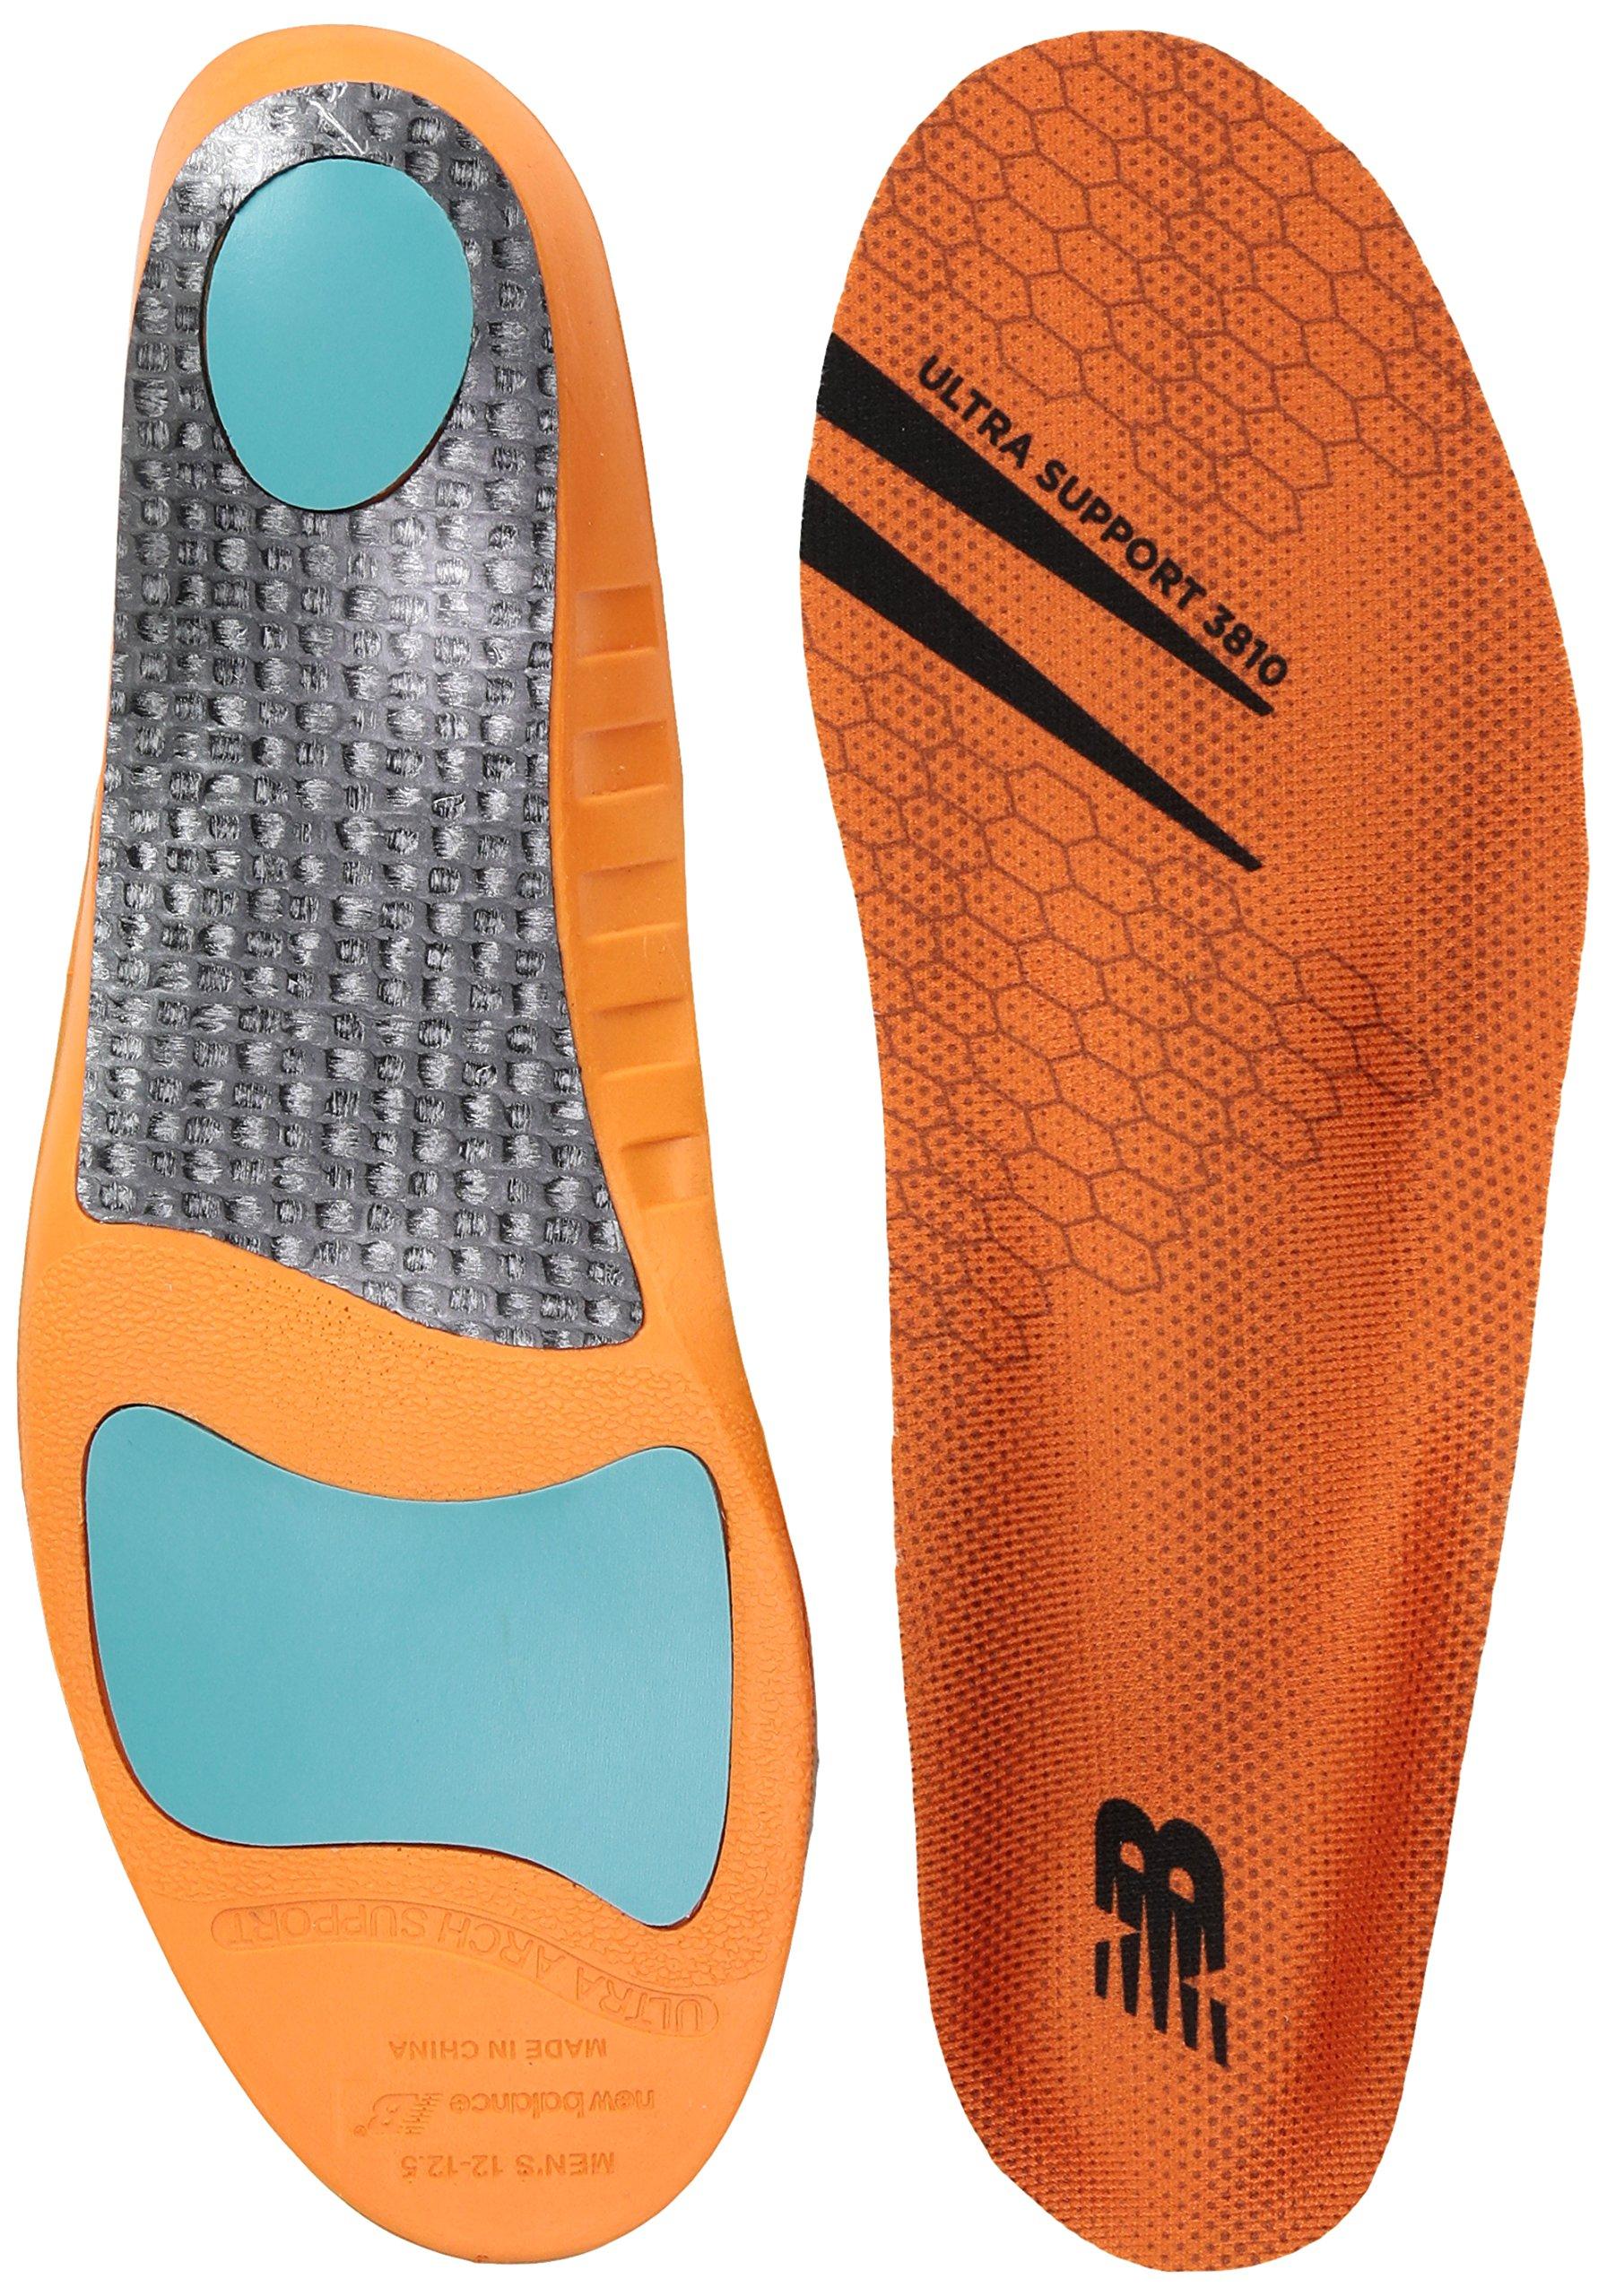 New Balance Insoles 3810 Ultra Support Insole Shoe, orange, 8.5-9 W US Women / 7-7.5 M US Men by New Balance